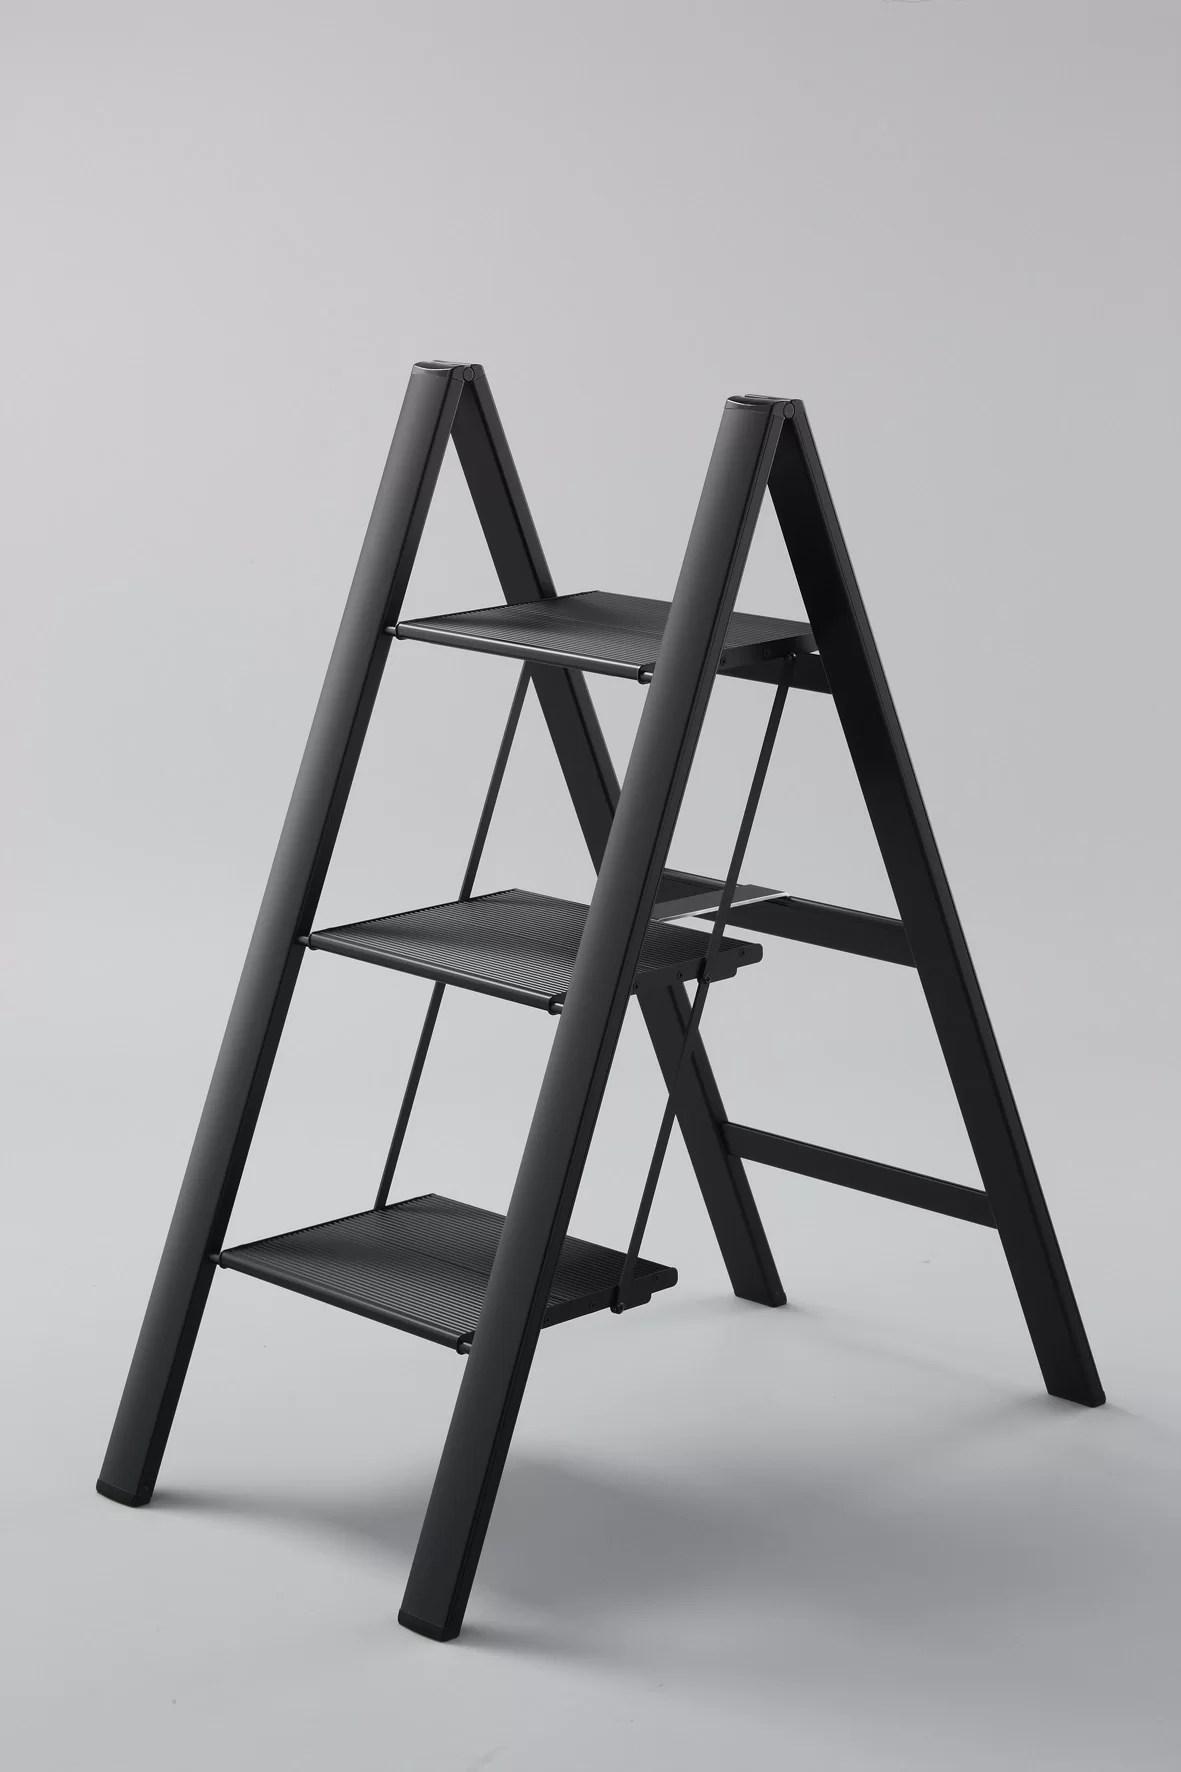 Wfx Utility 3 Step Aluminum Lightweight Folding Step Stool Reviews Wayfair